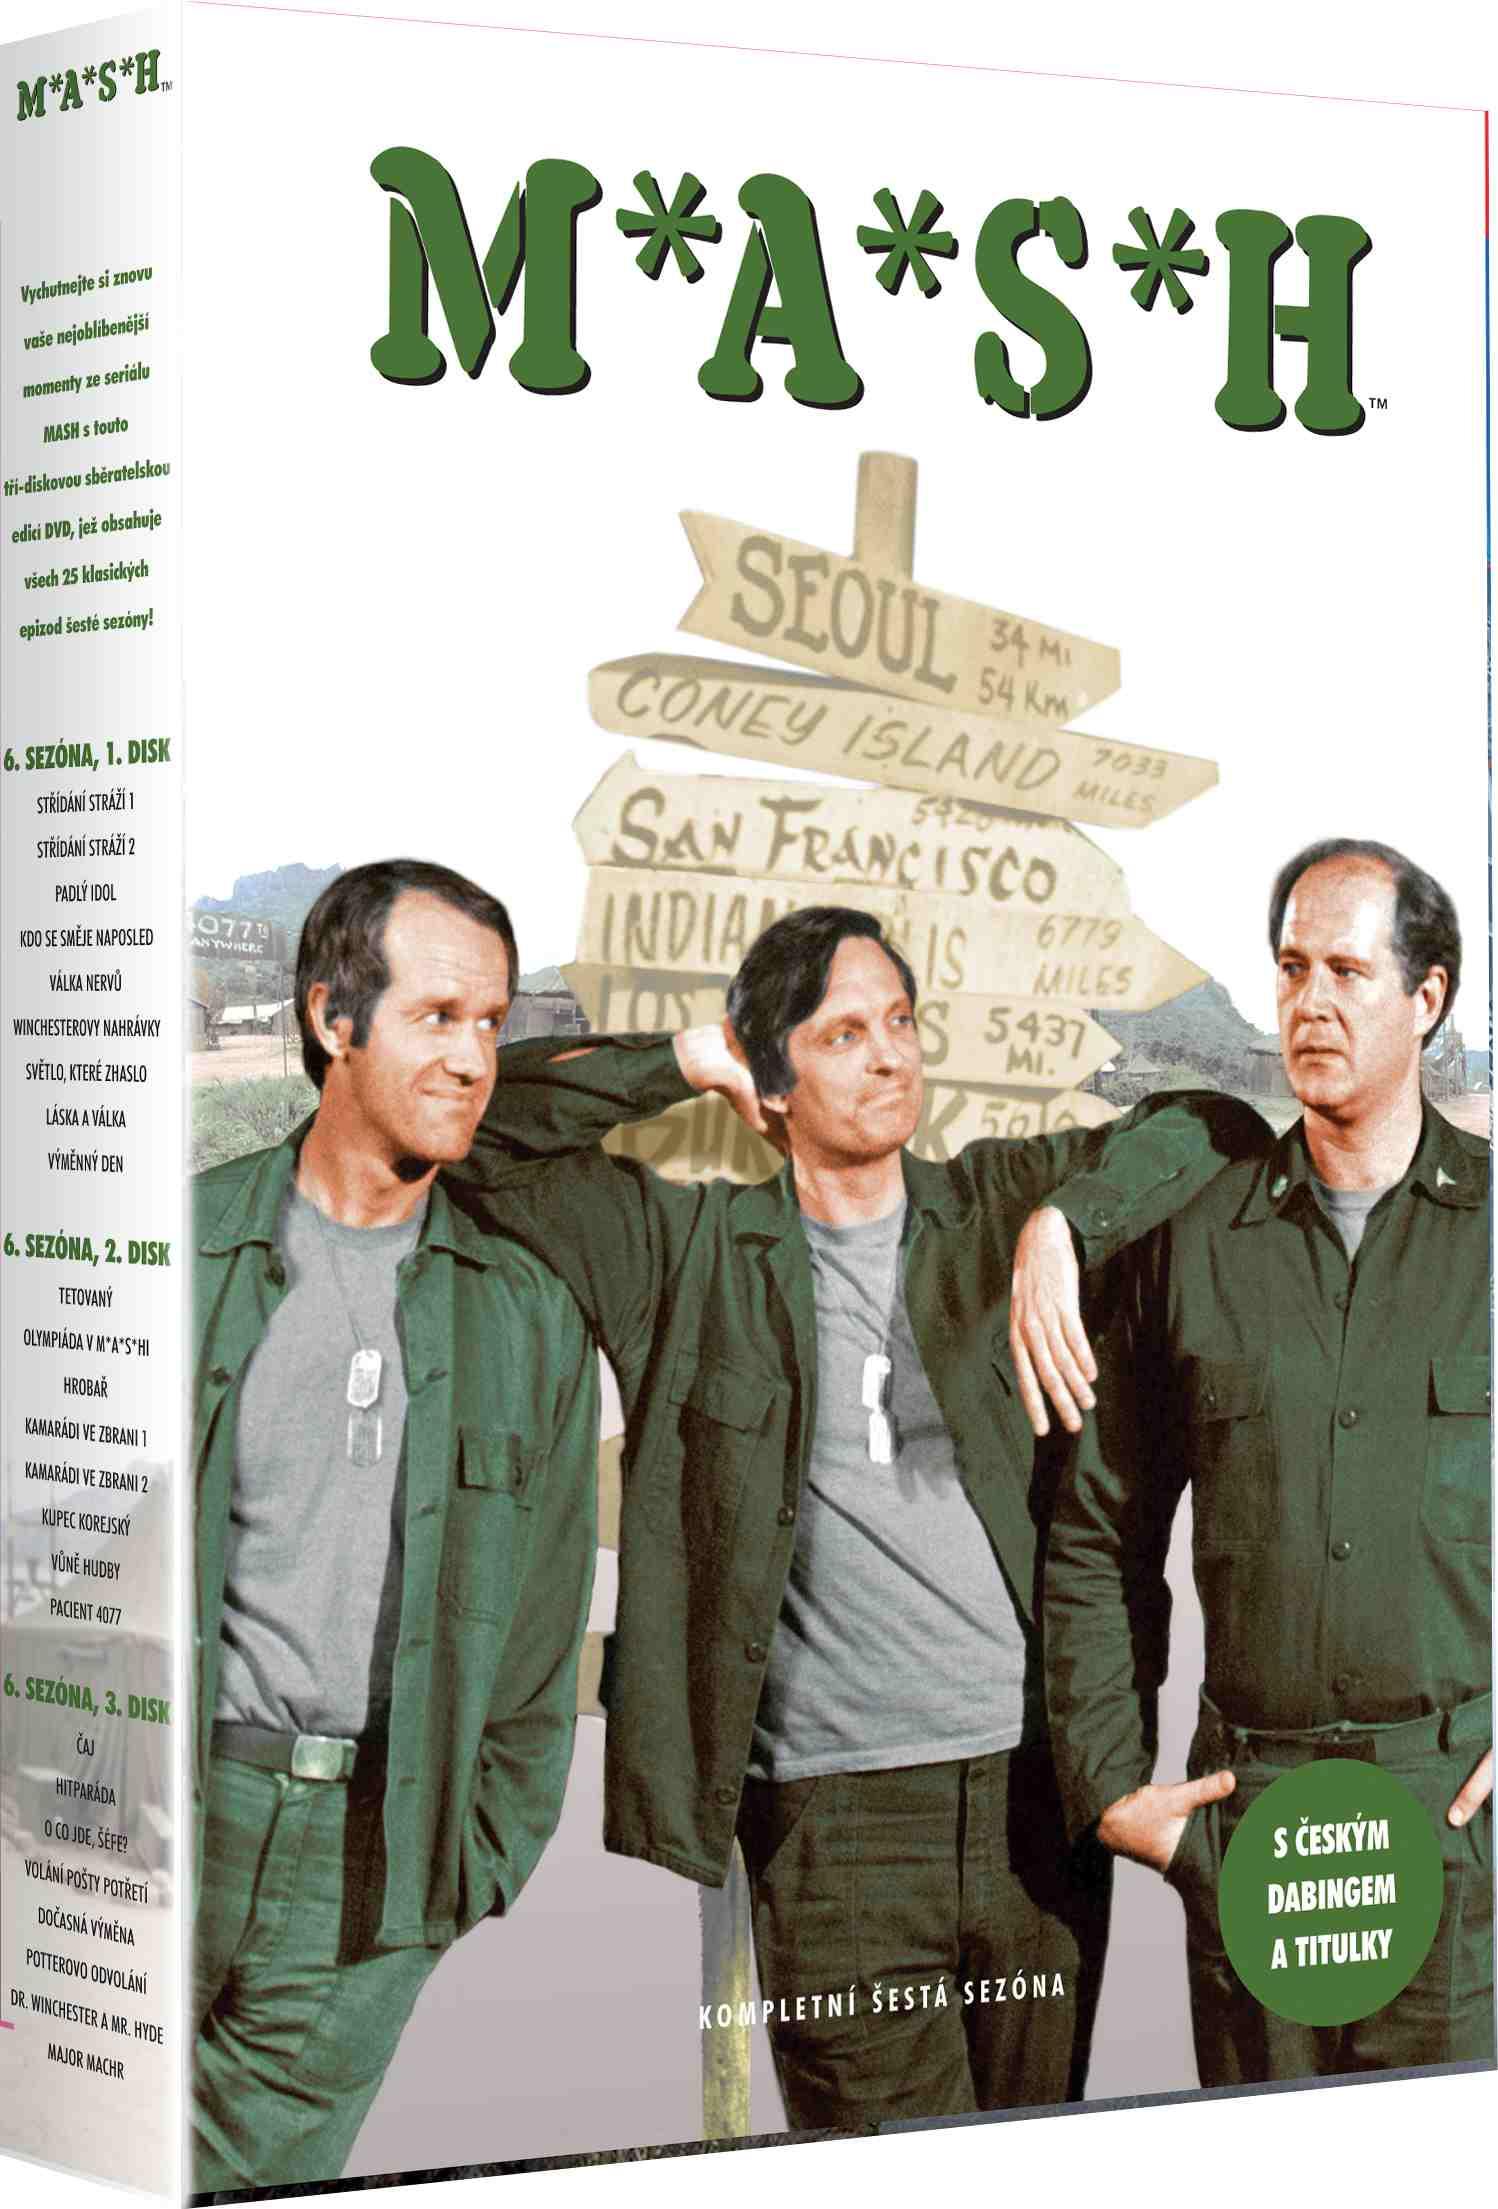 Mash (M.A.S.H.) - 6. série - DVD